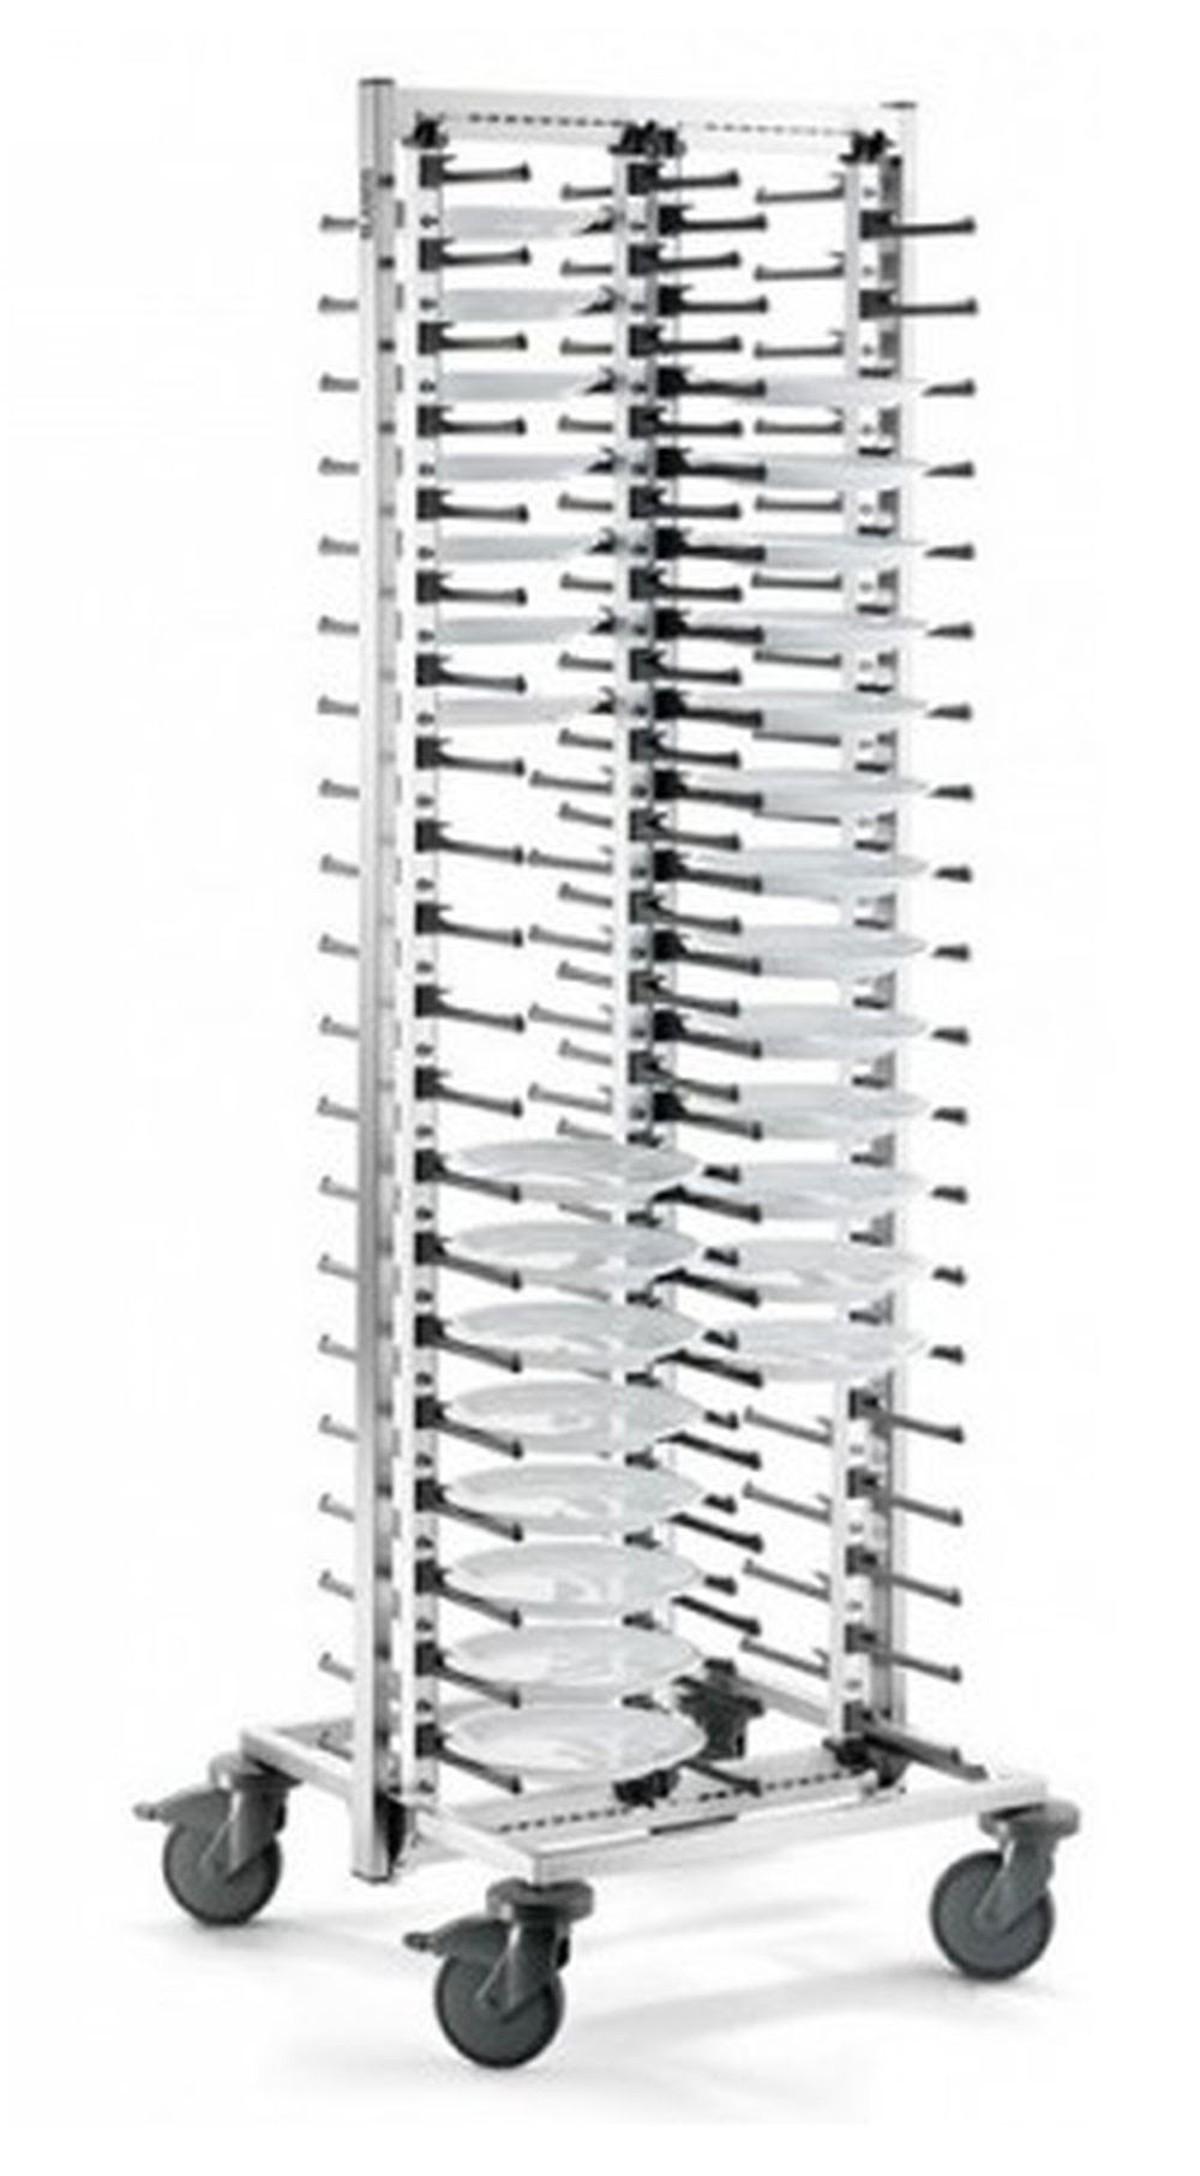 Servistar Gastronorm 80 Plate Rack  sc 1 st  Secondhand Catering Equipment & Secondhand Catering Equipment | Jack Stands or Plate Racks | 9x ...